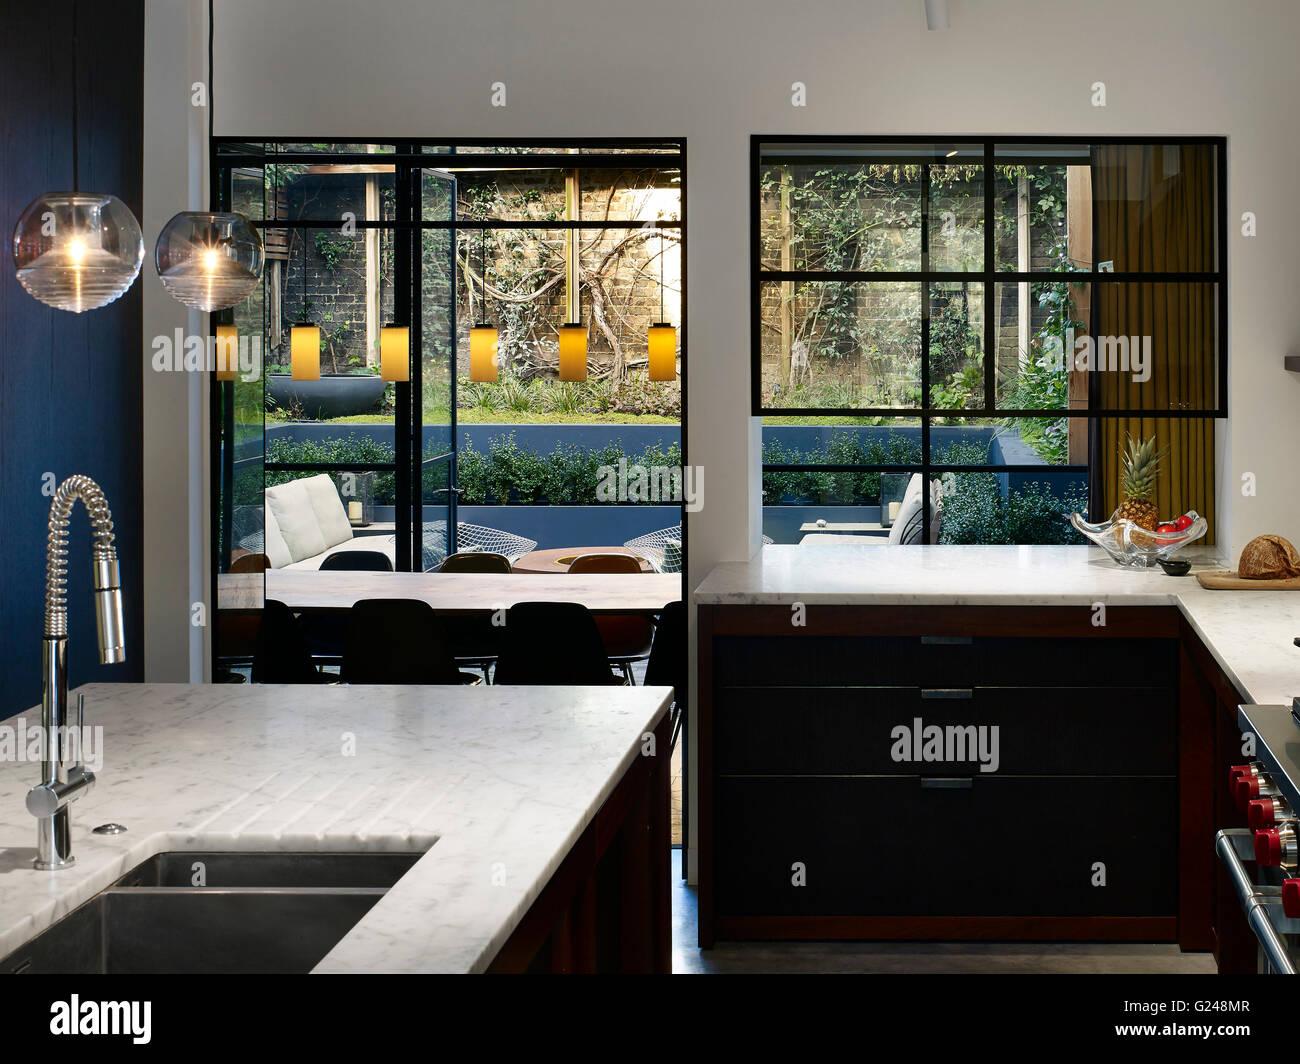 Kitchen, View Of Garden. West London Villa, LONDON, United Kingdom.  Architect: Stiff + Trevillion Architects, 2015.